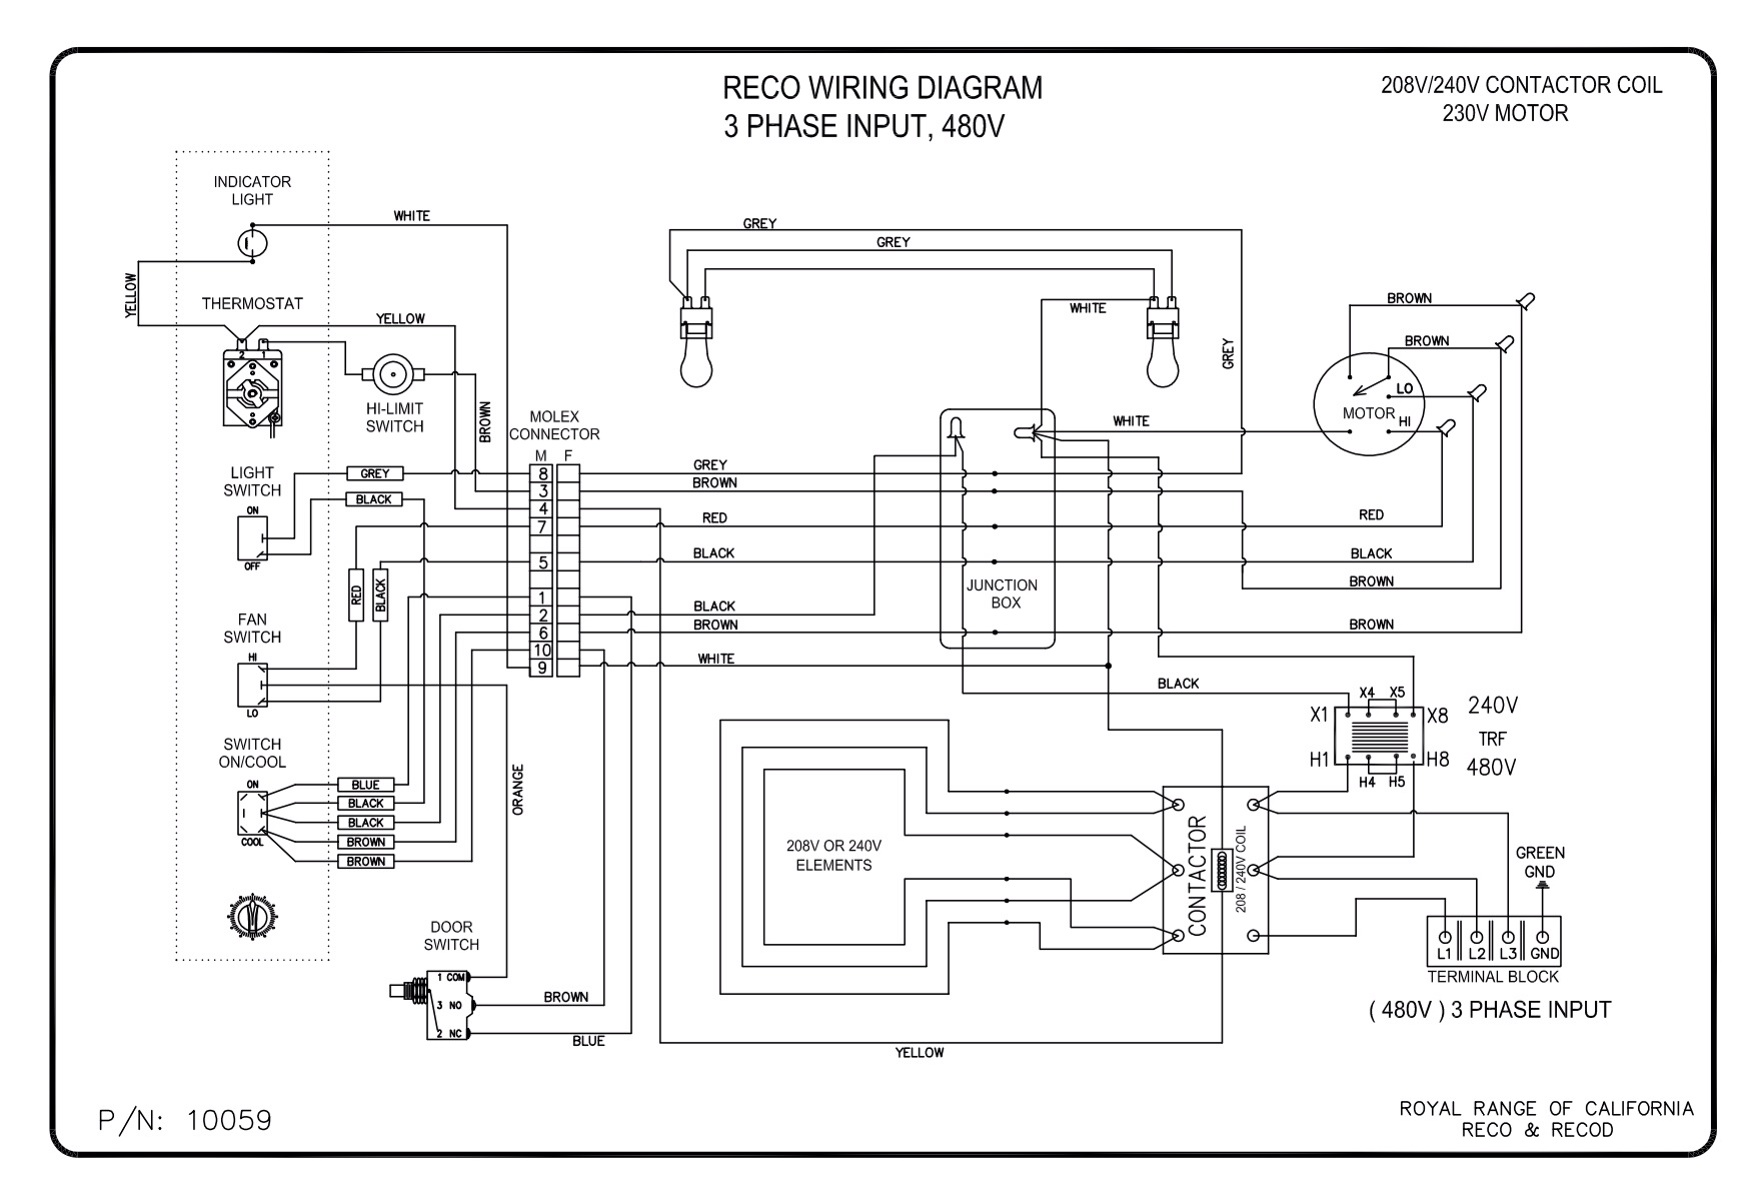 3 Phase Air Compressor Wiring Diagram Wiring Diagrams Royal Range Of California